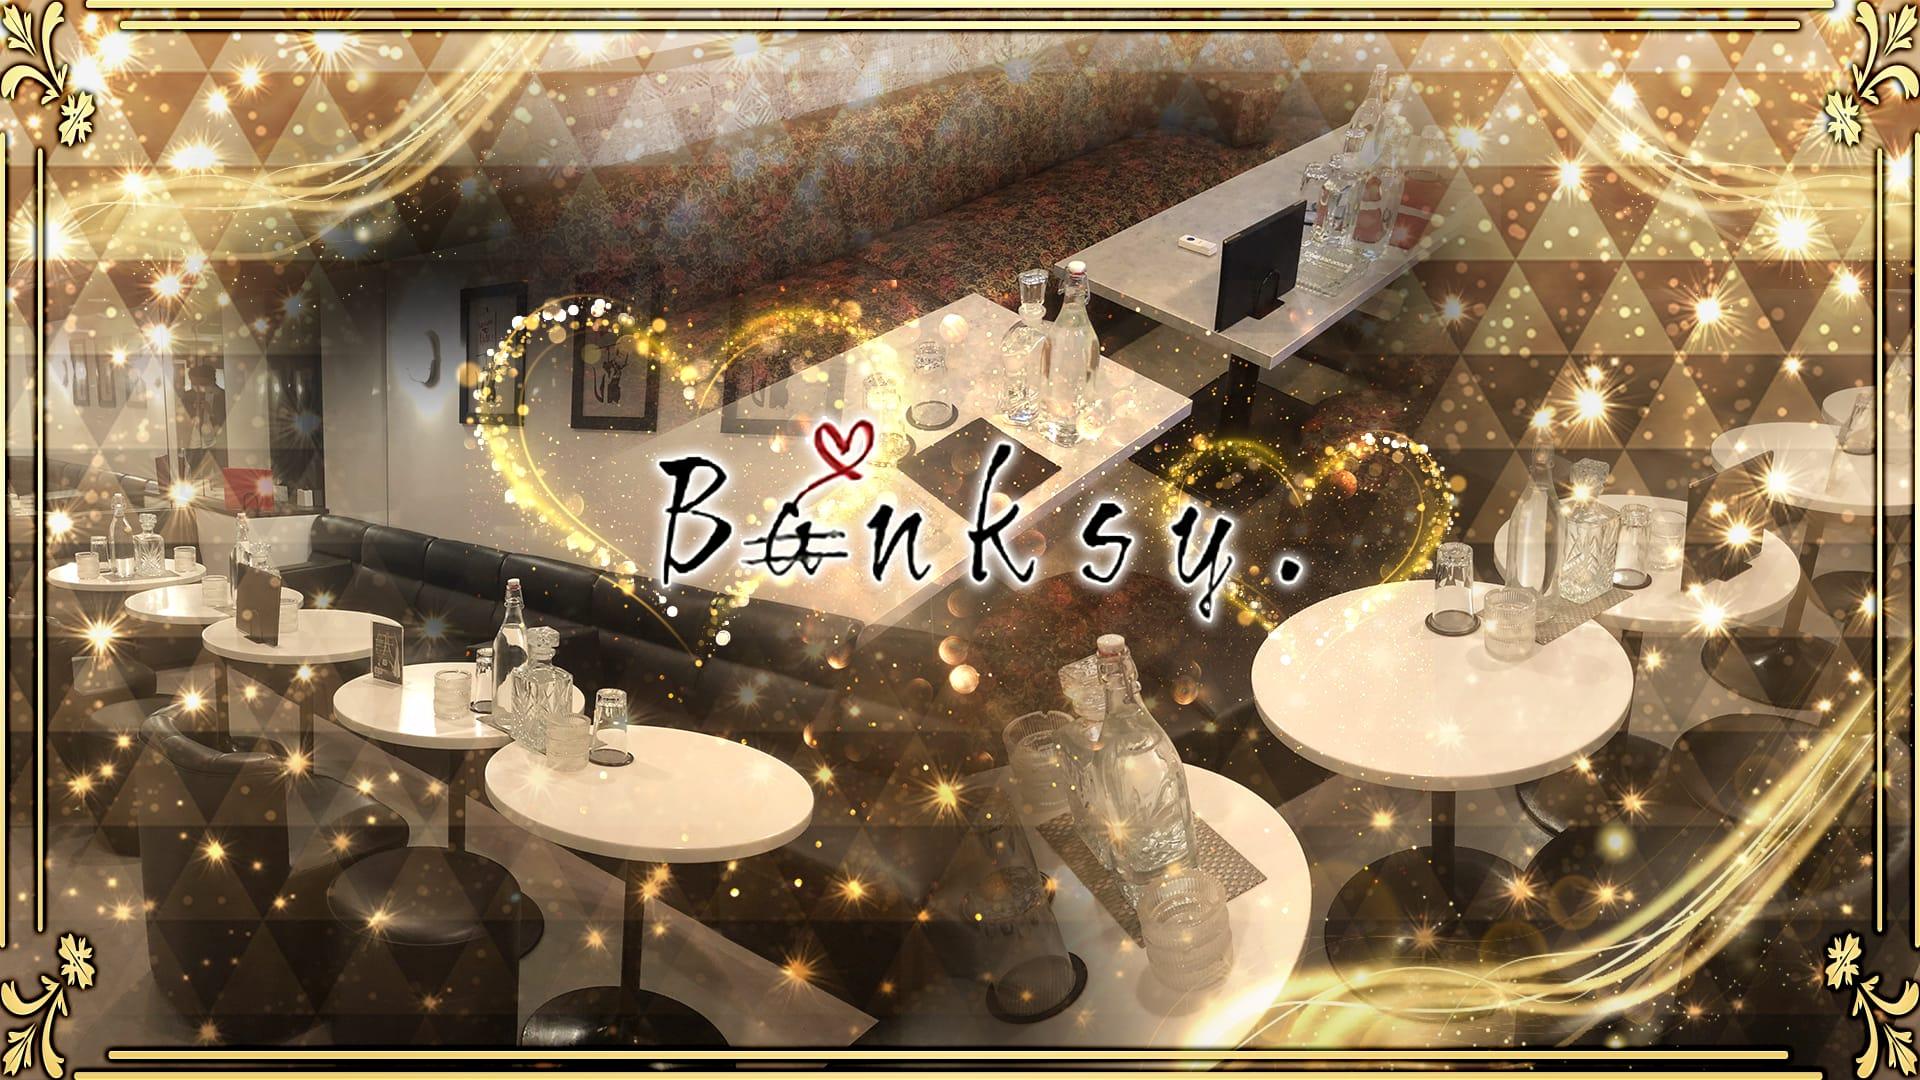 Banksy.(バンクシー) 千葉キャバクラ TOP画像